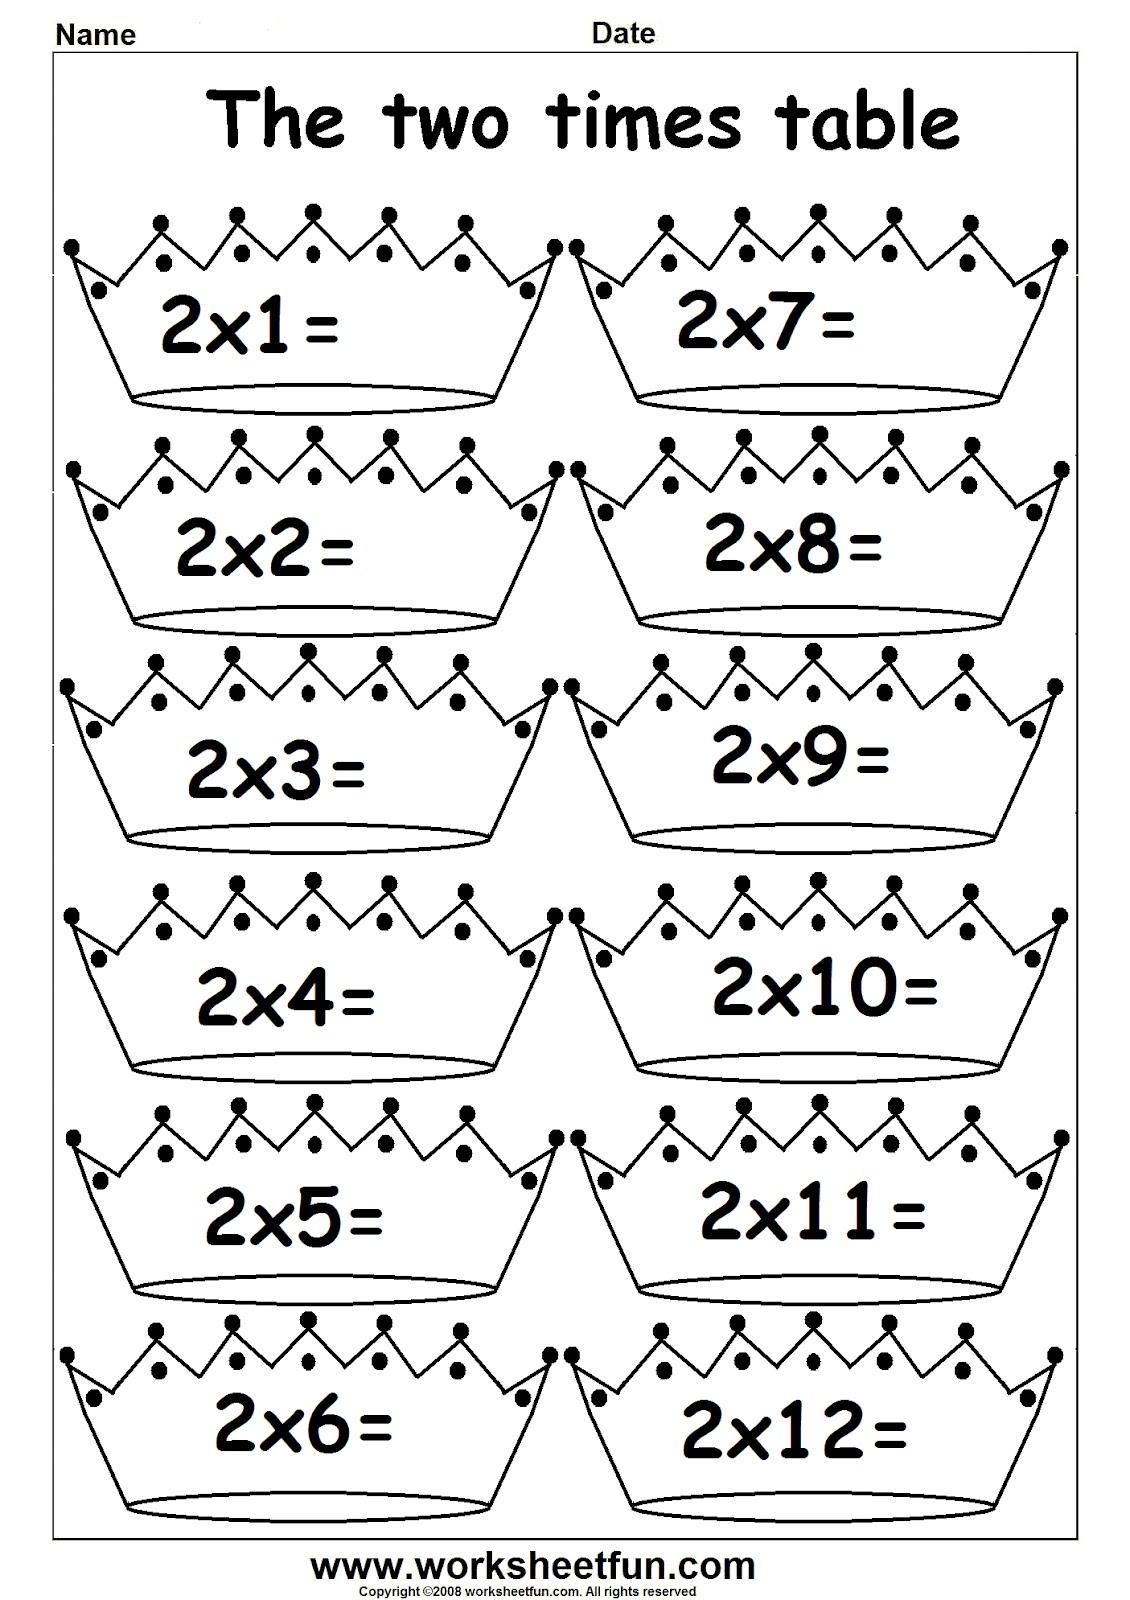 arab unity school grade 1 c blog maths multiply by 2 worksheets. Black Bedroom Furniture Sets. Home Design Ideas